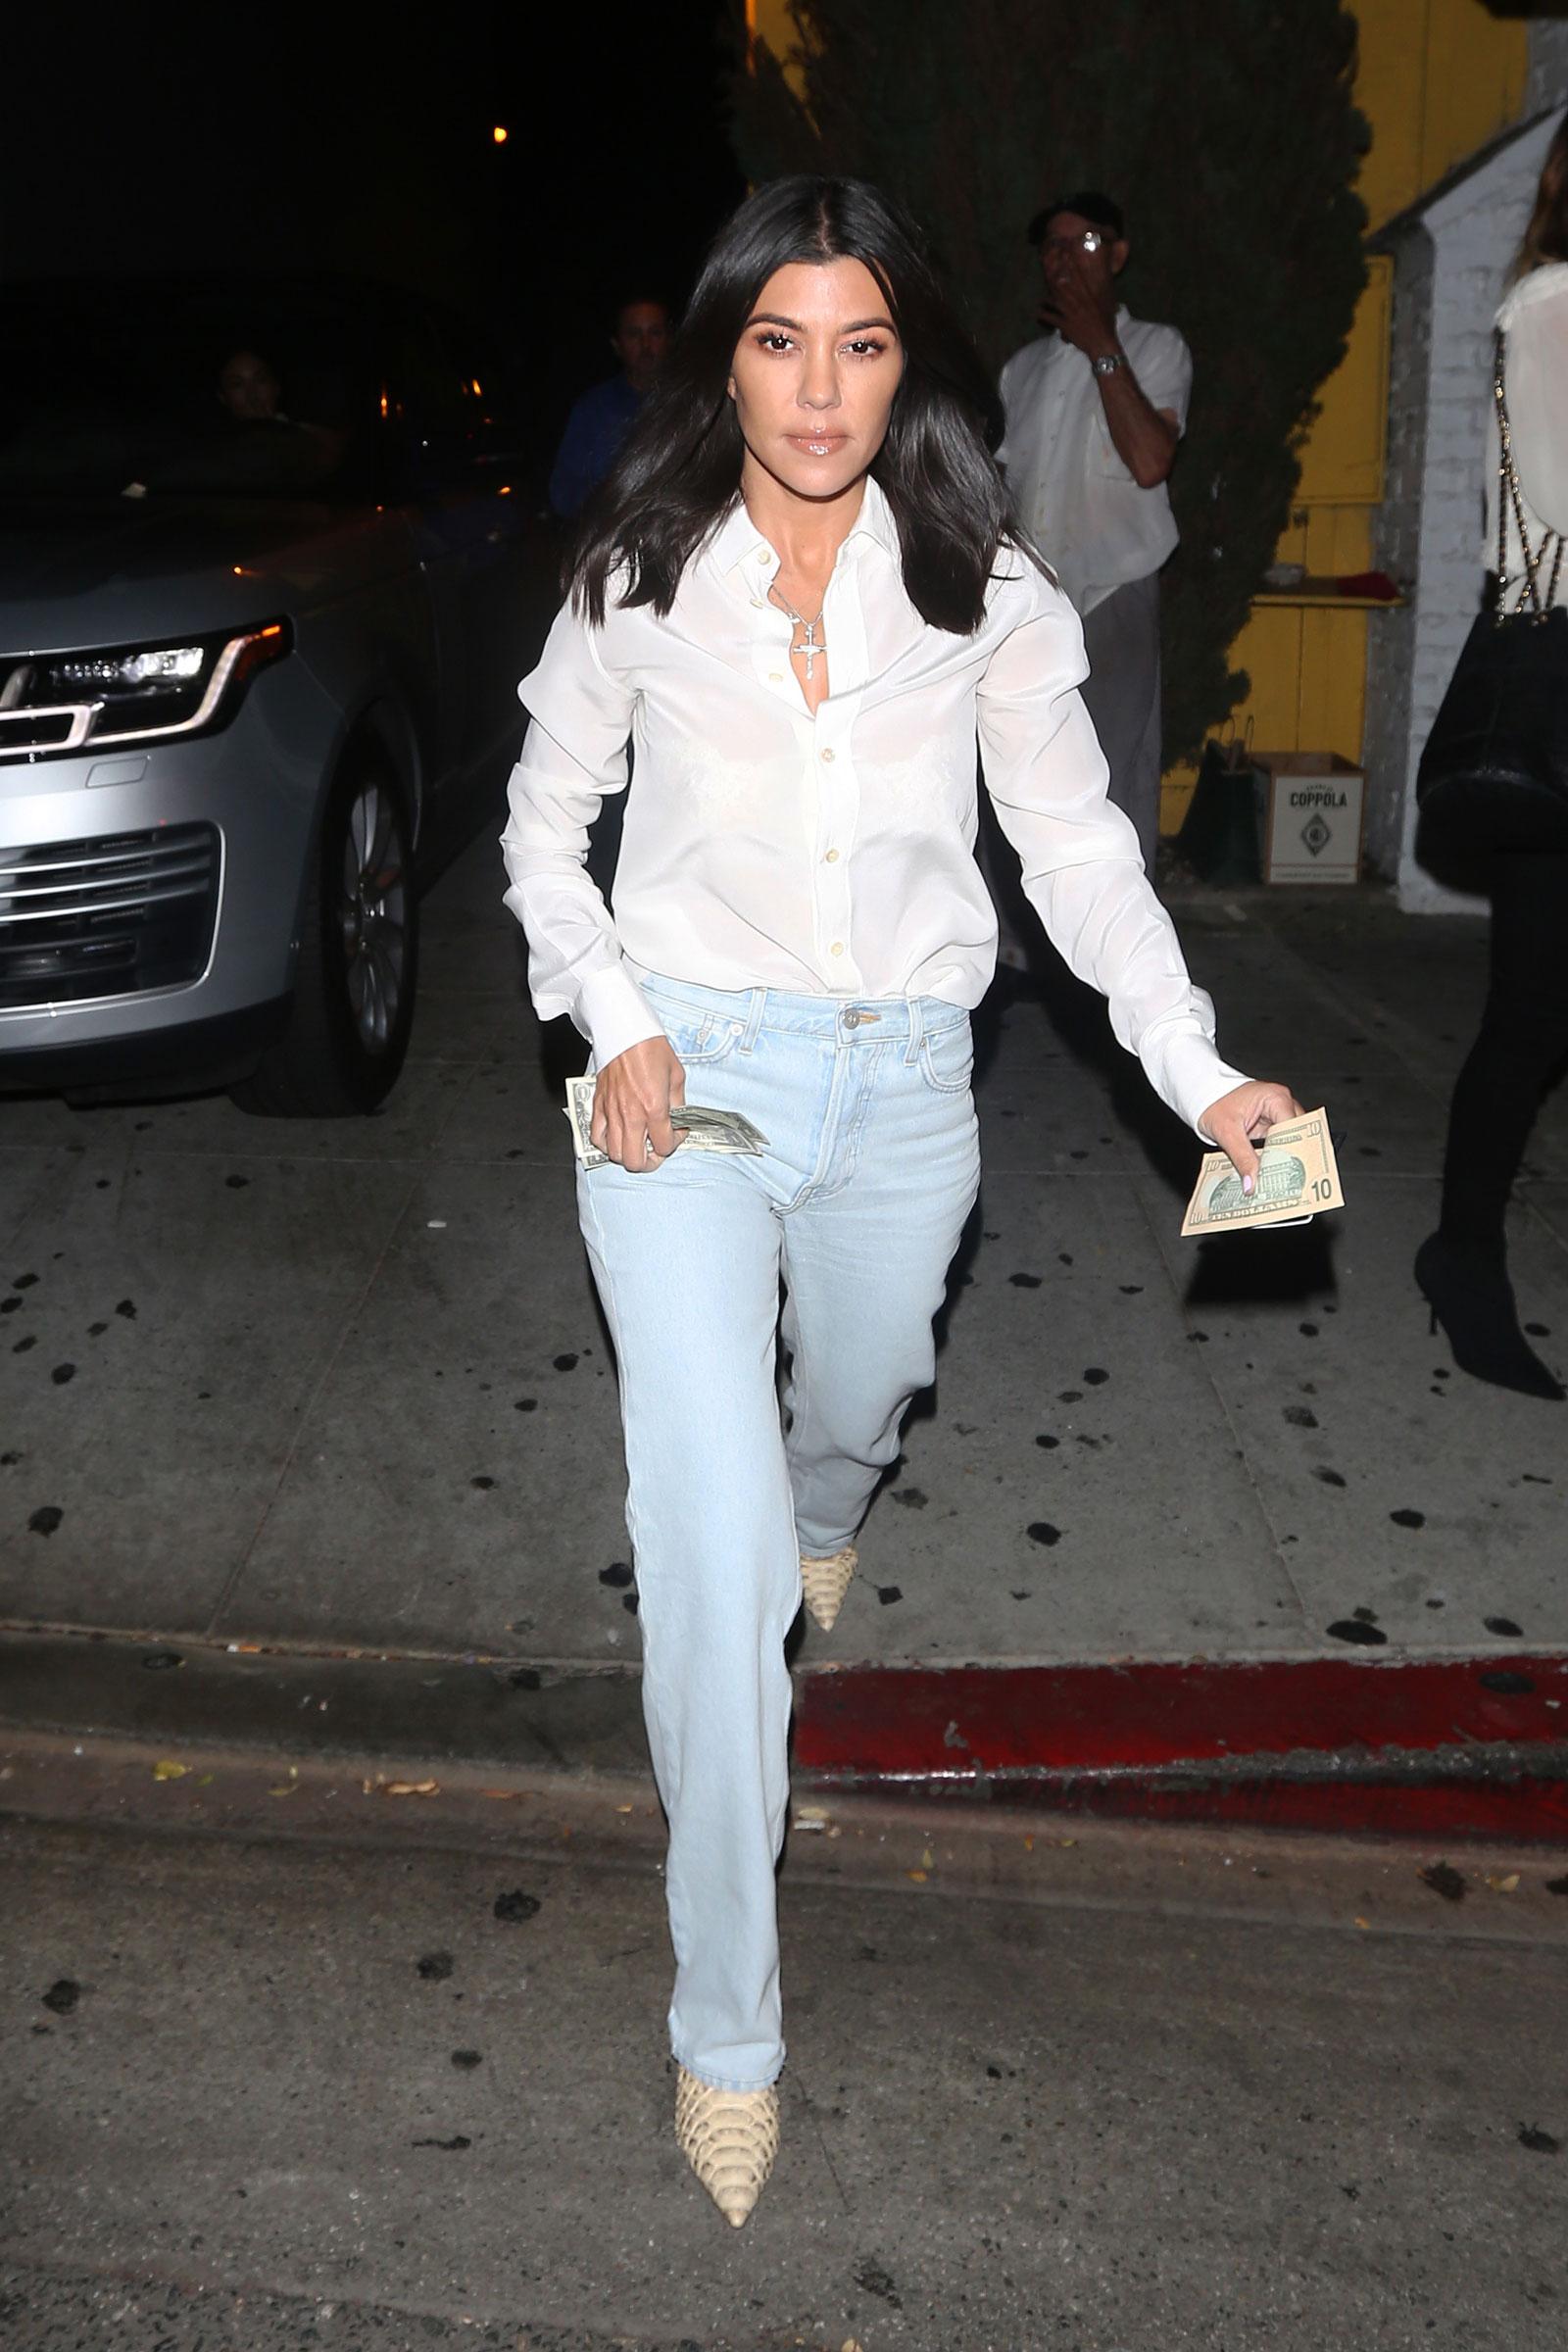 19ad52d0485 Kourtney Kardashian Python Boots and White Shirt